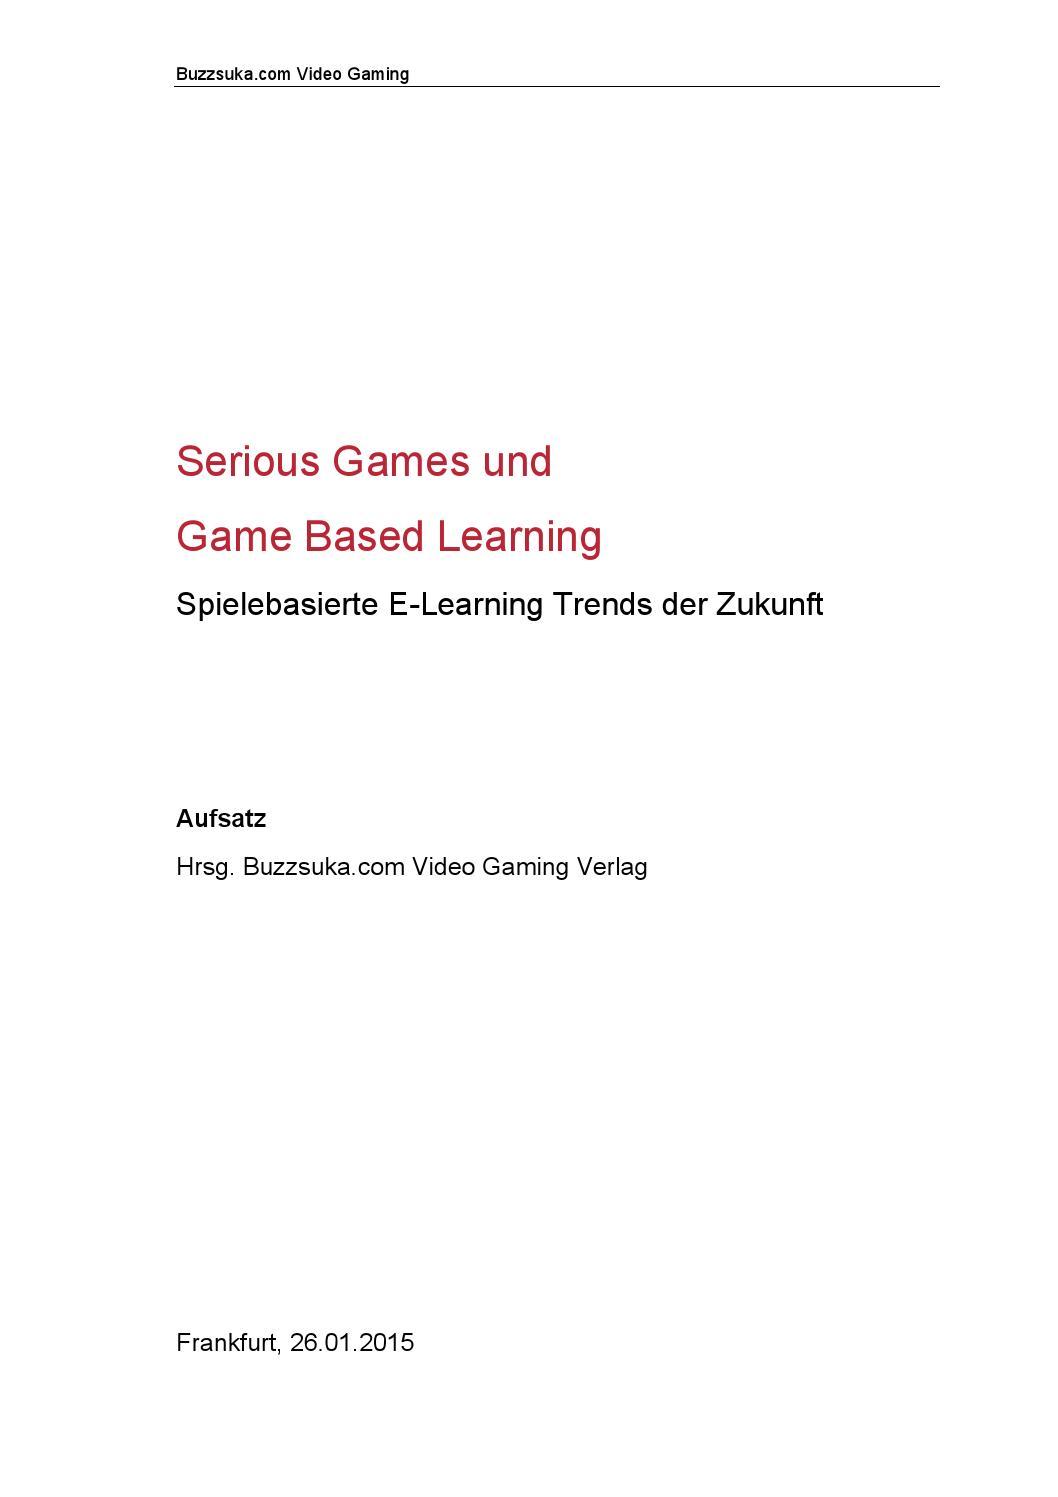 Serious Games und Digital Game Based Learning - Spielebasierte E ...